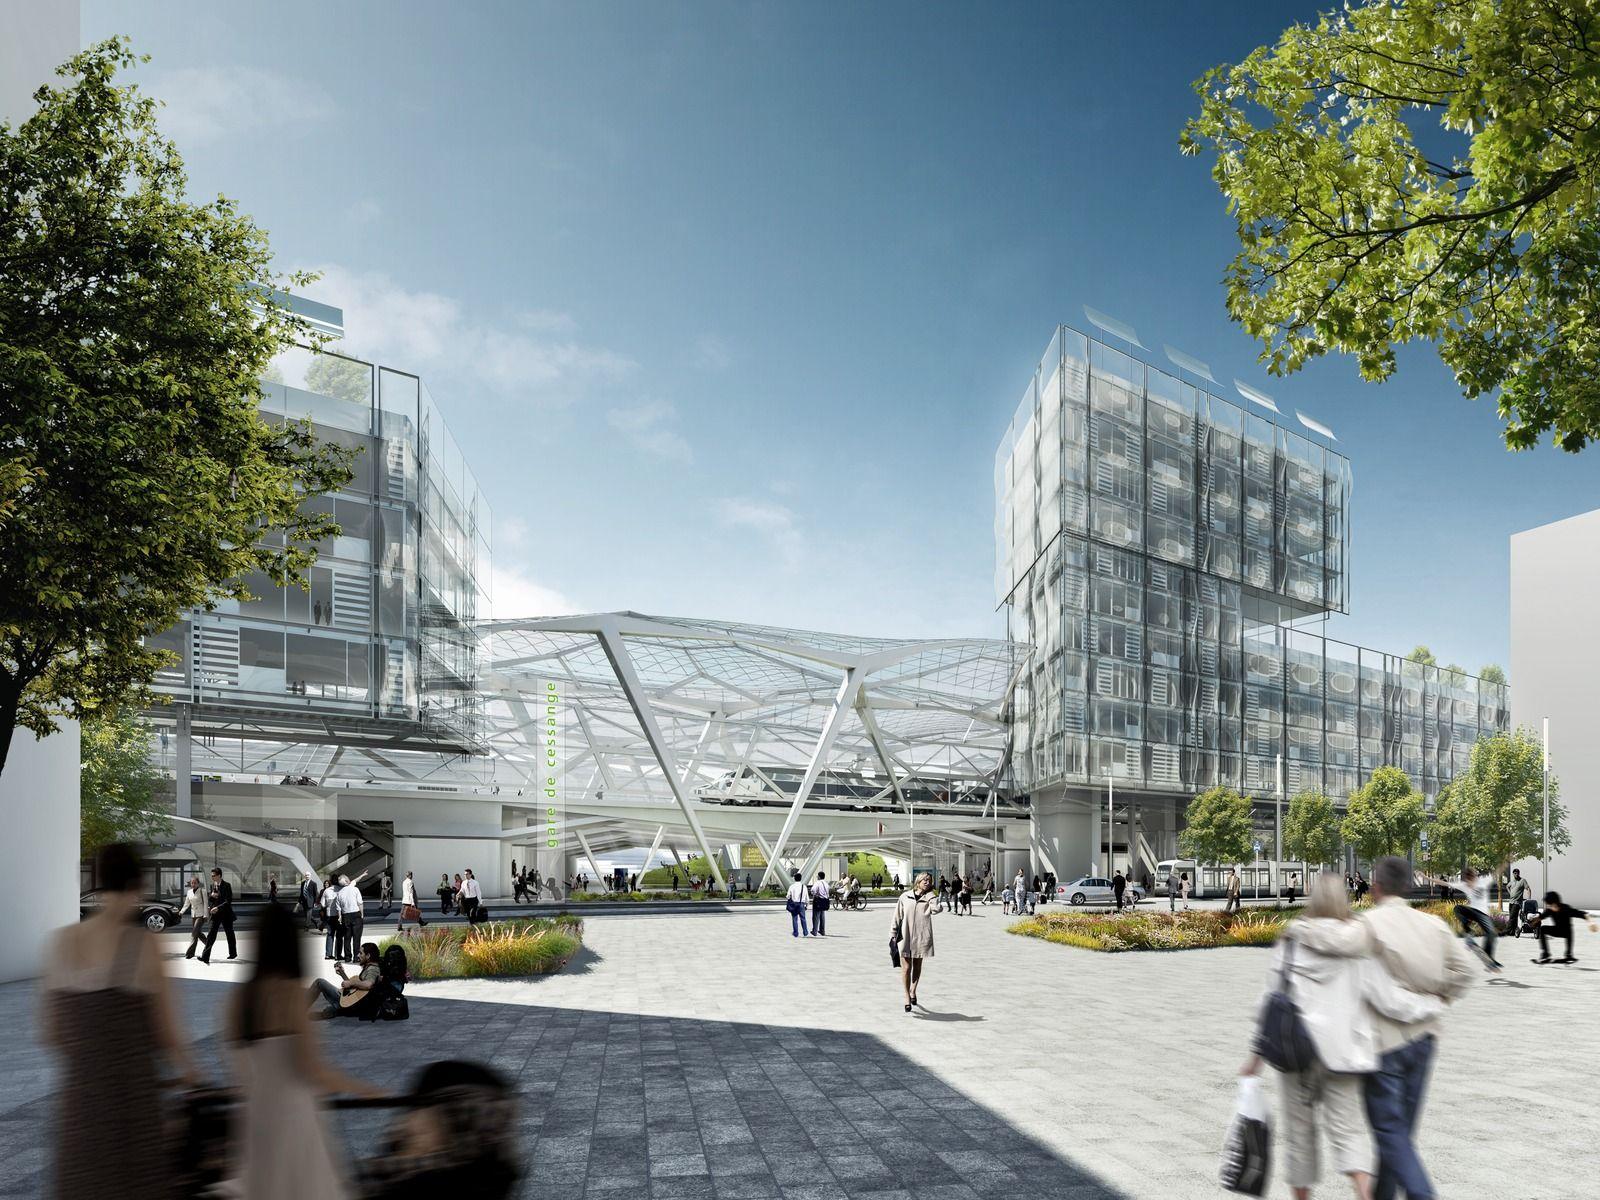 Architekt Luxemburg luxemburg central station pohl architekten stadtplaner 2009